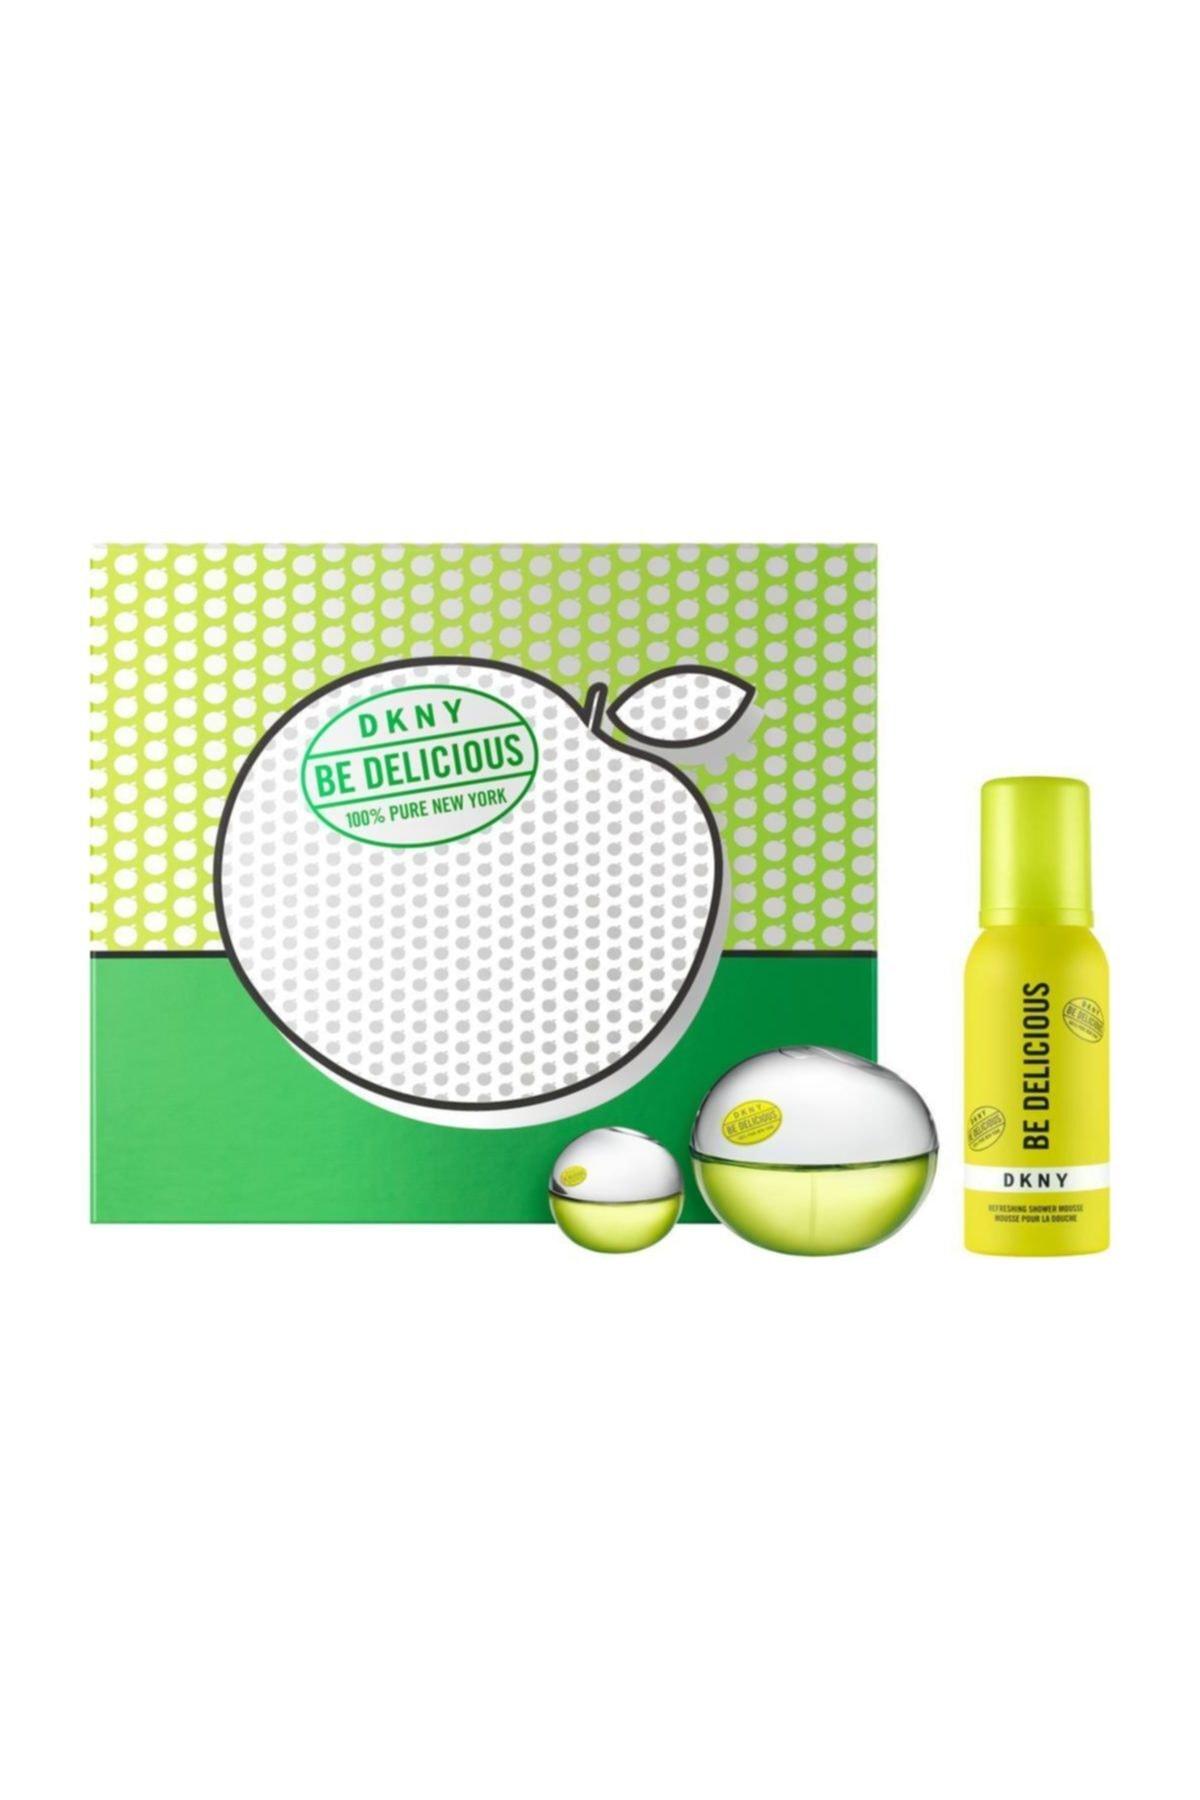 Dkny Be Delicious Kadın Sprey Parfüm Seti 022548413081 1